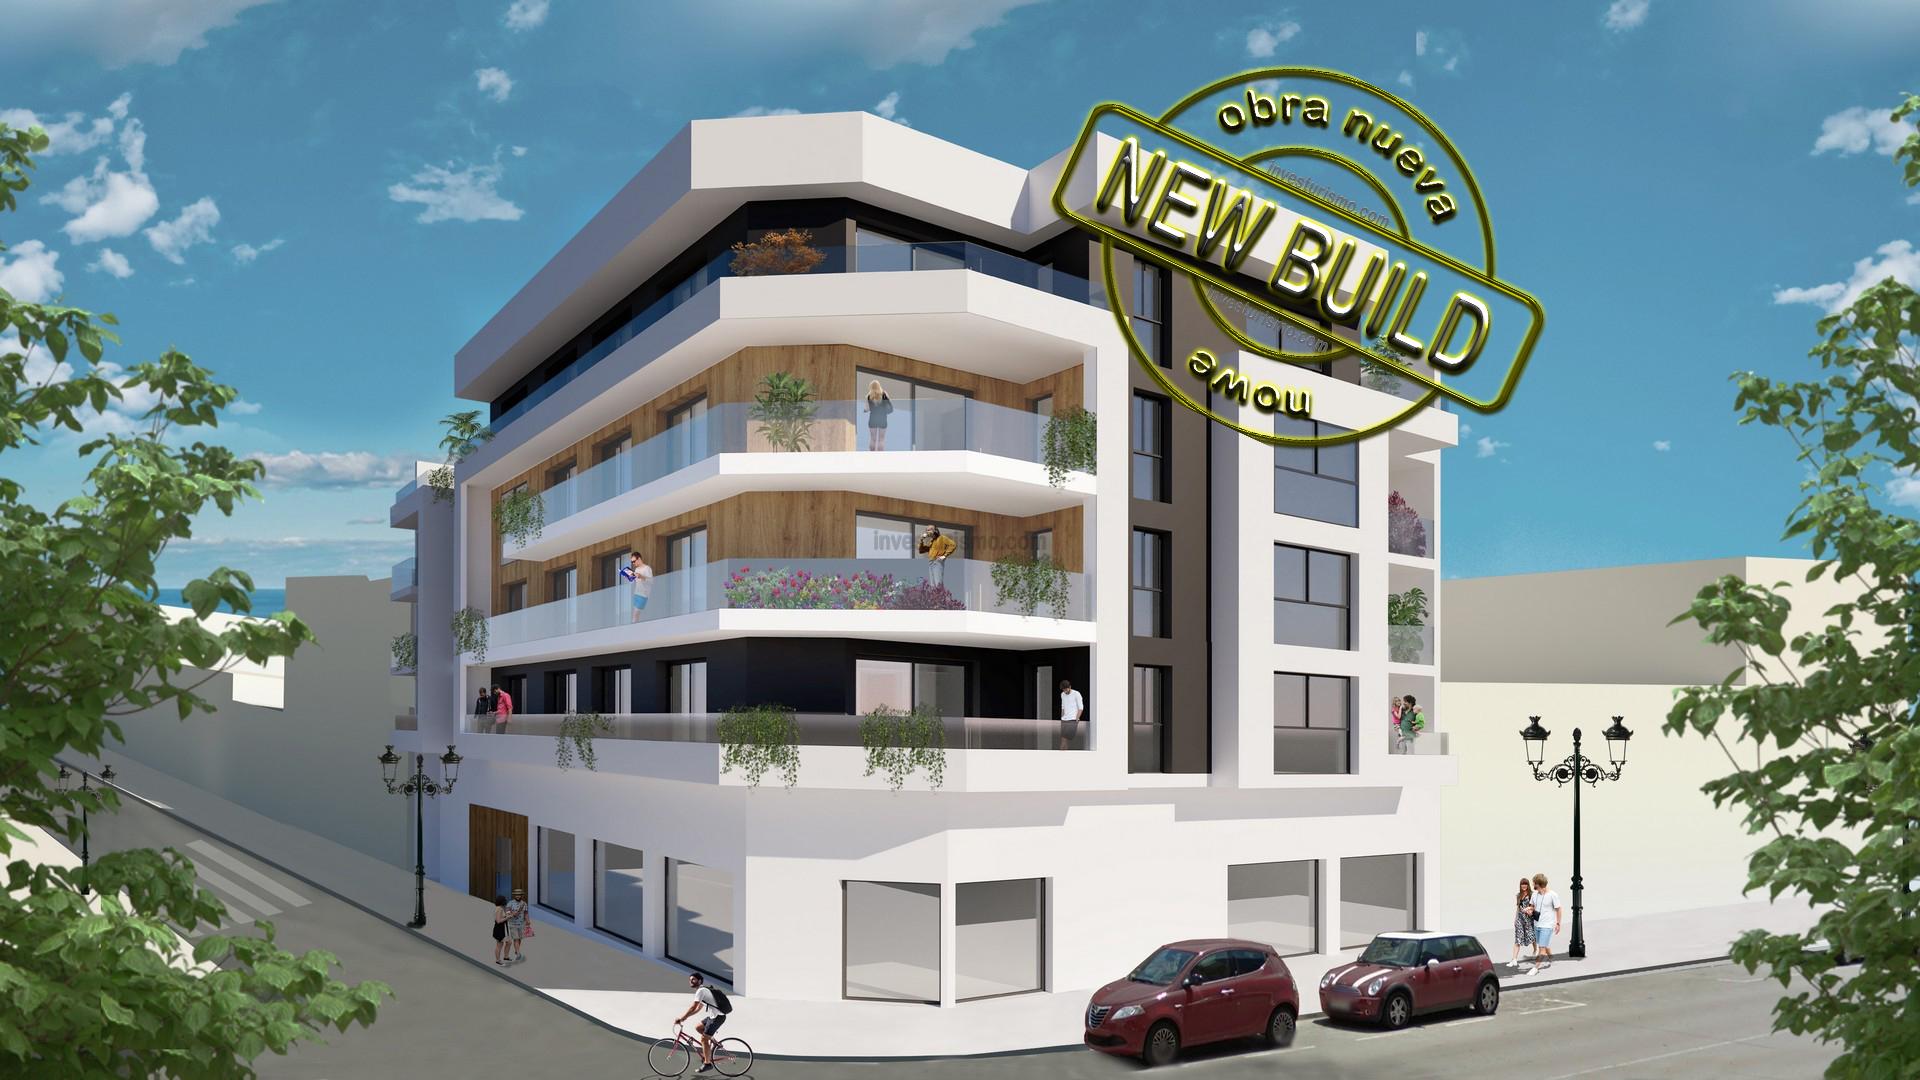 New build Apartments 2-3 bedrooms in Guardamar